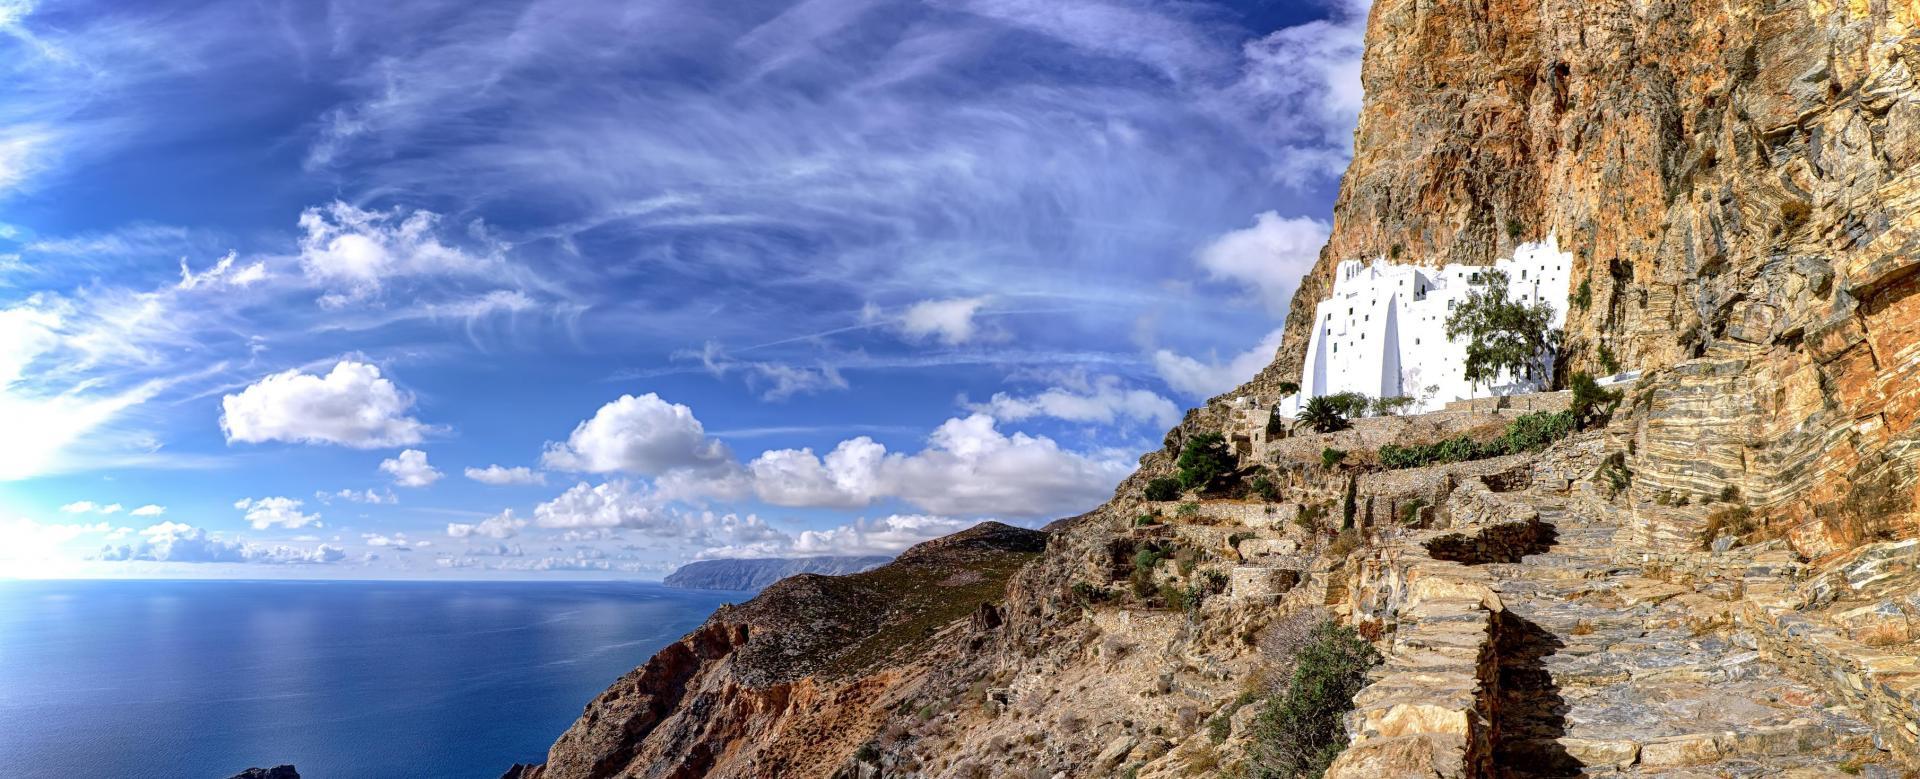 Voyage à pied Grèce : Tinos, naxos et amorgos